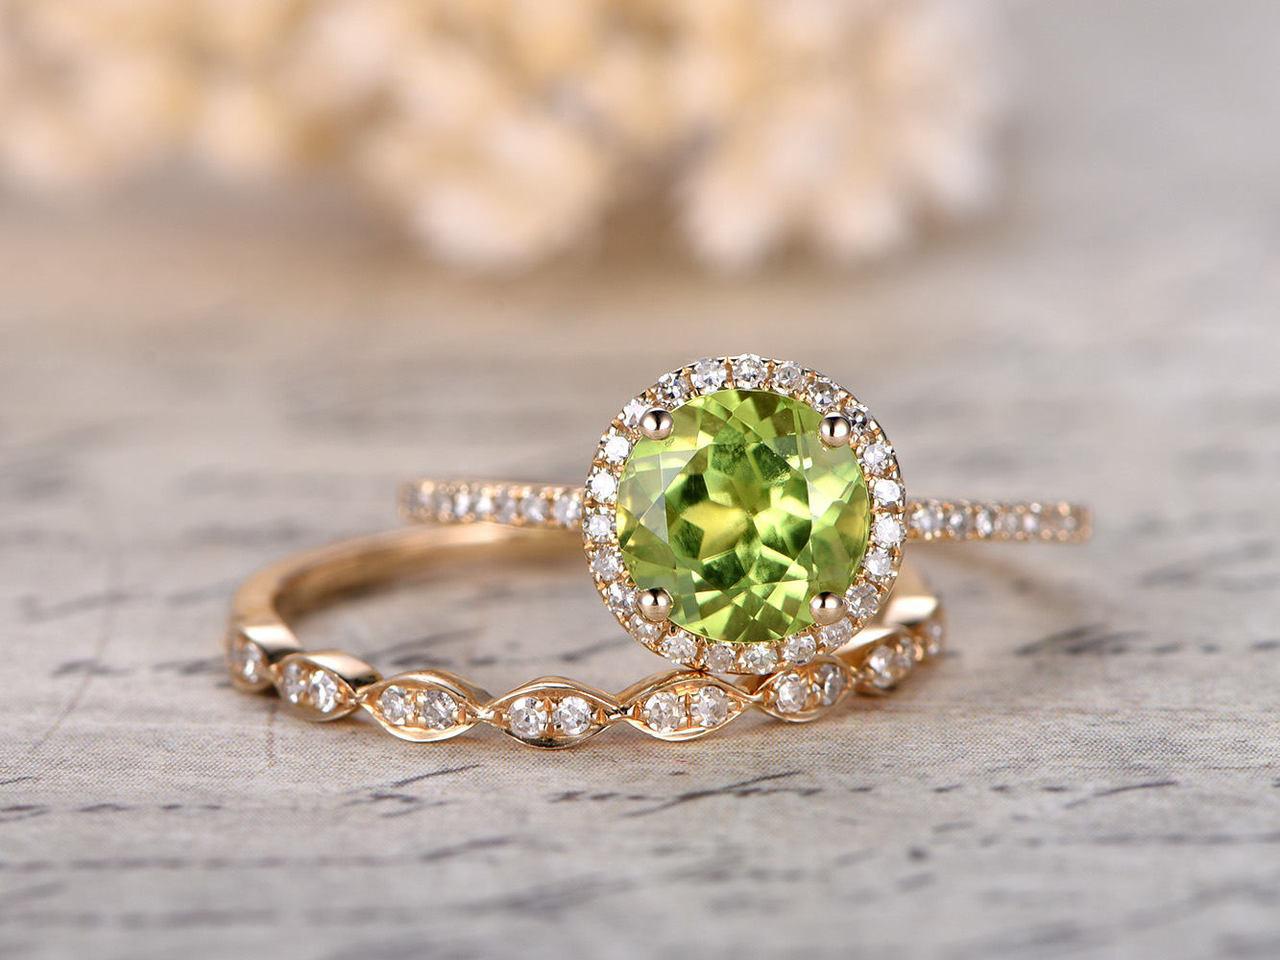 Peridot Engagement Ring Set 7mm Round Cut Peridot Bridal Sets And